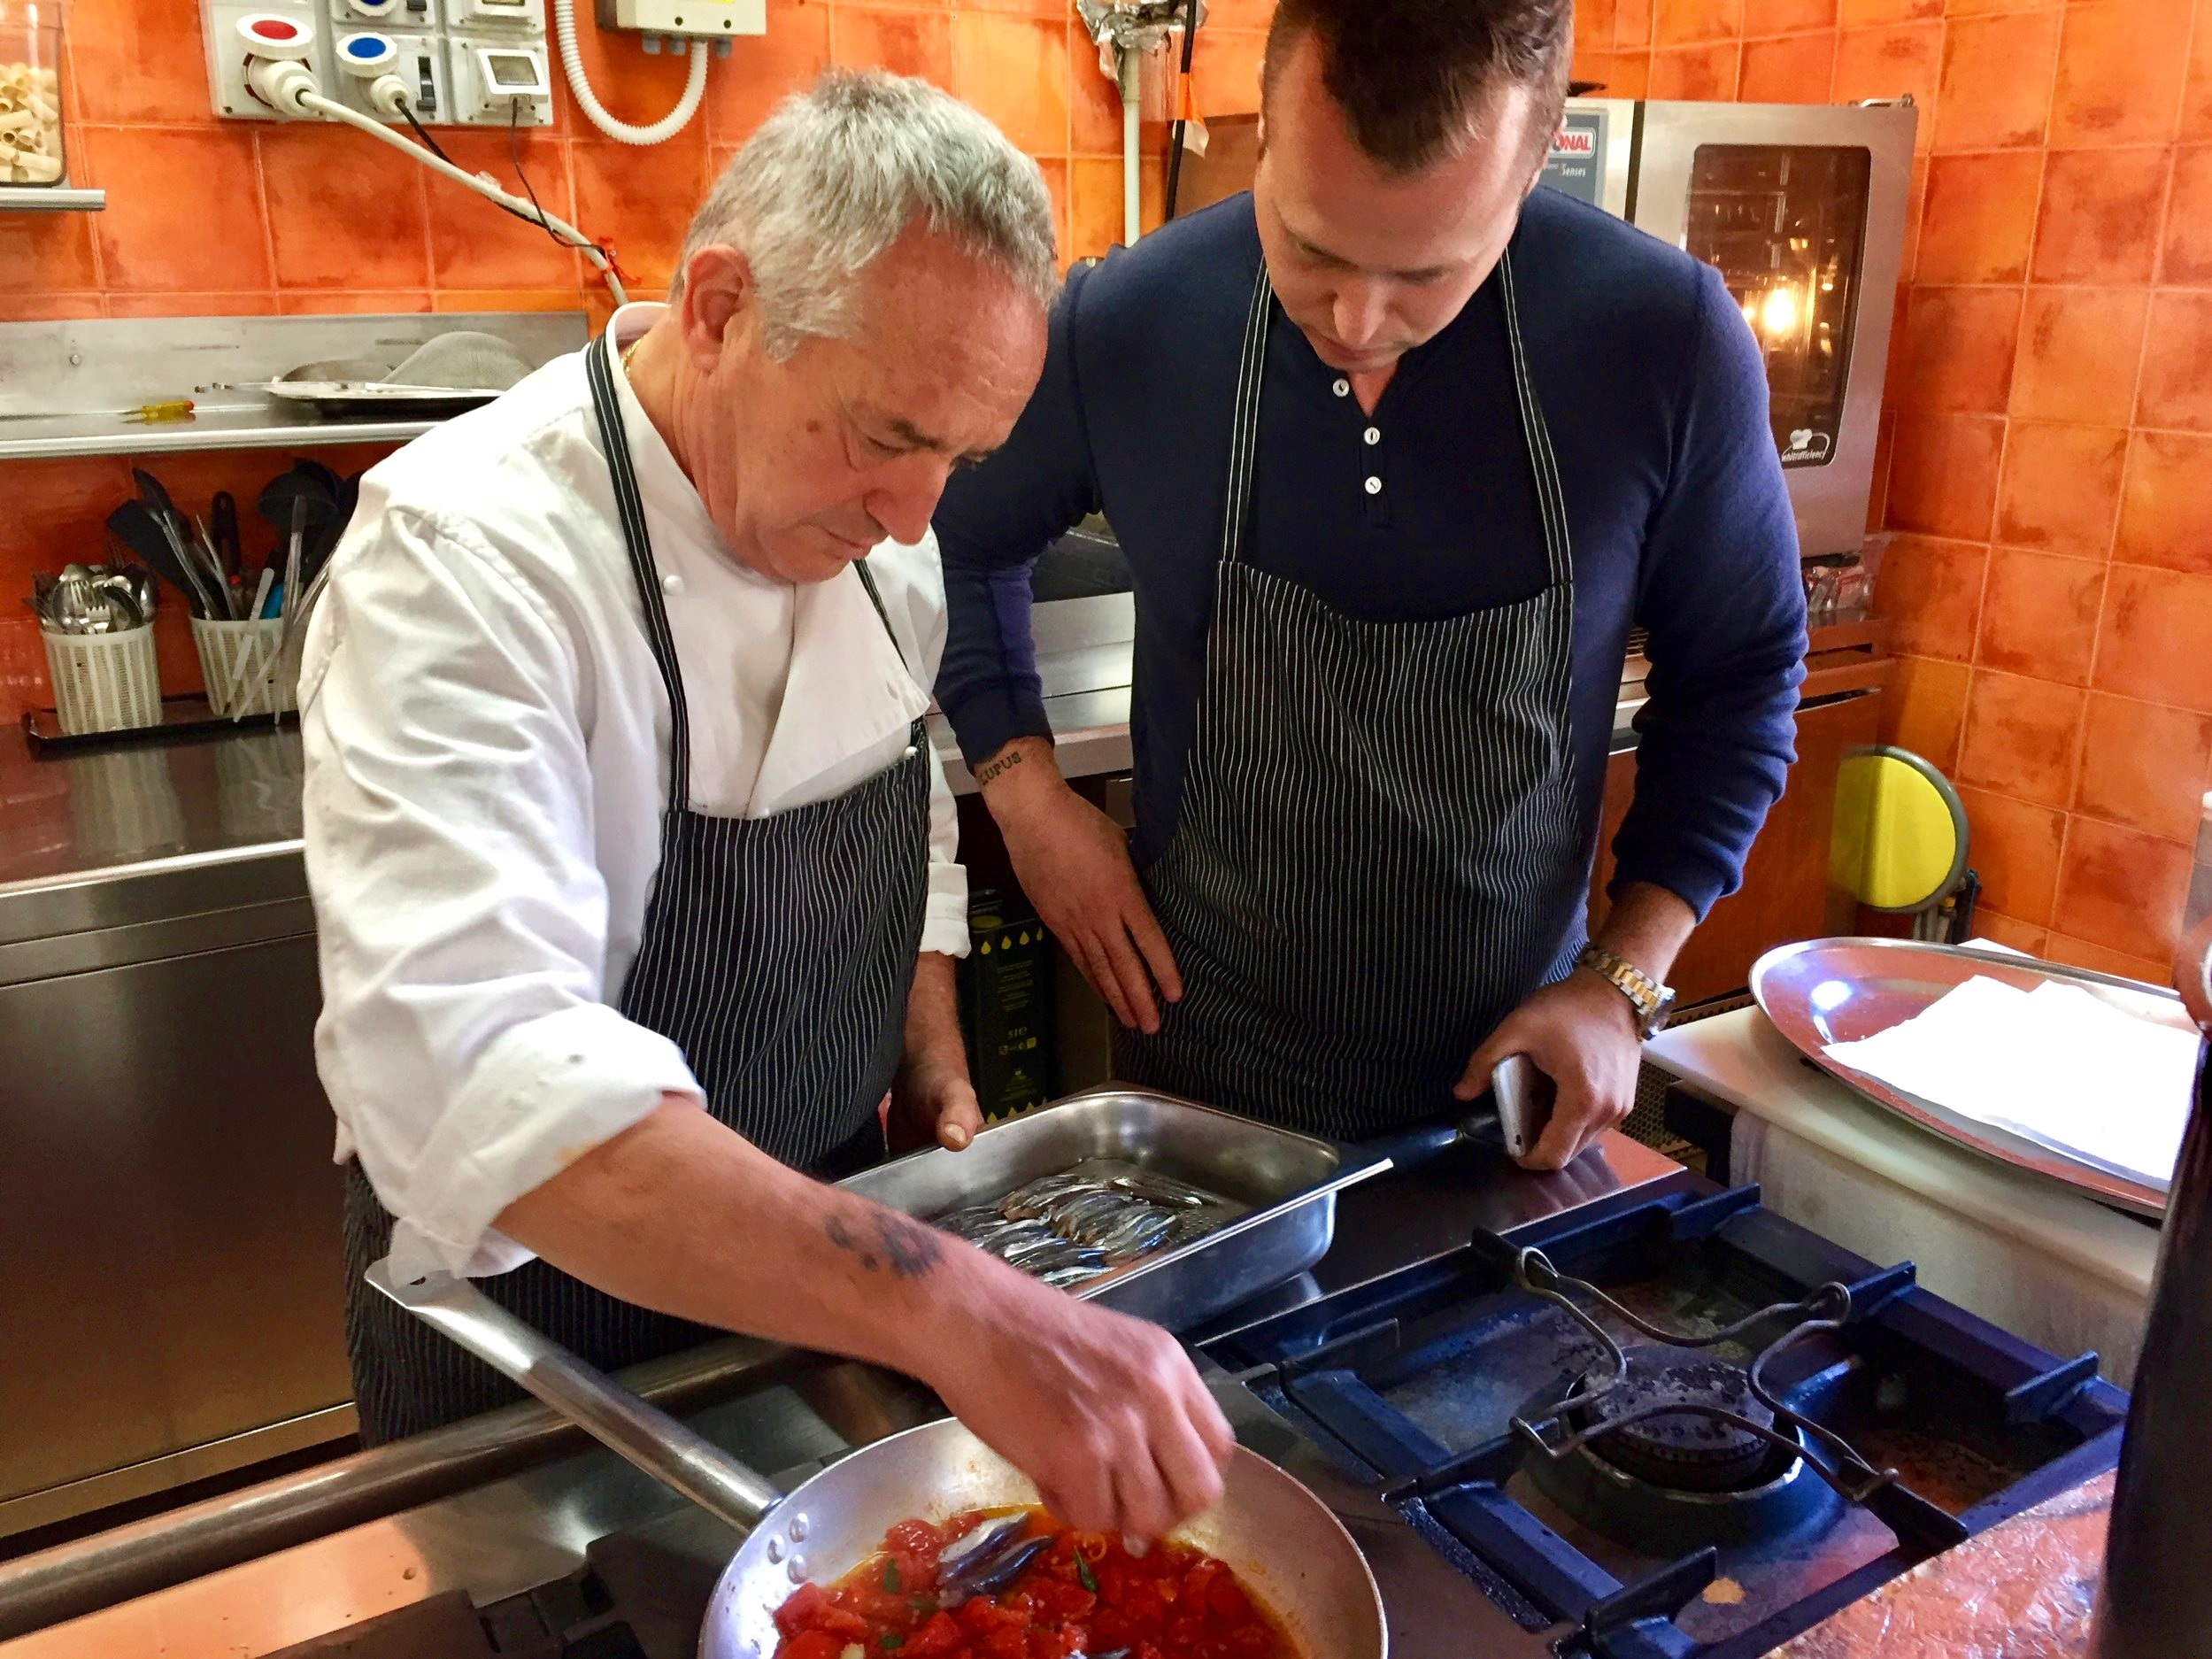 Masters of the kitchen - David Nayfeld and Gaetano Alia in Calabria